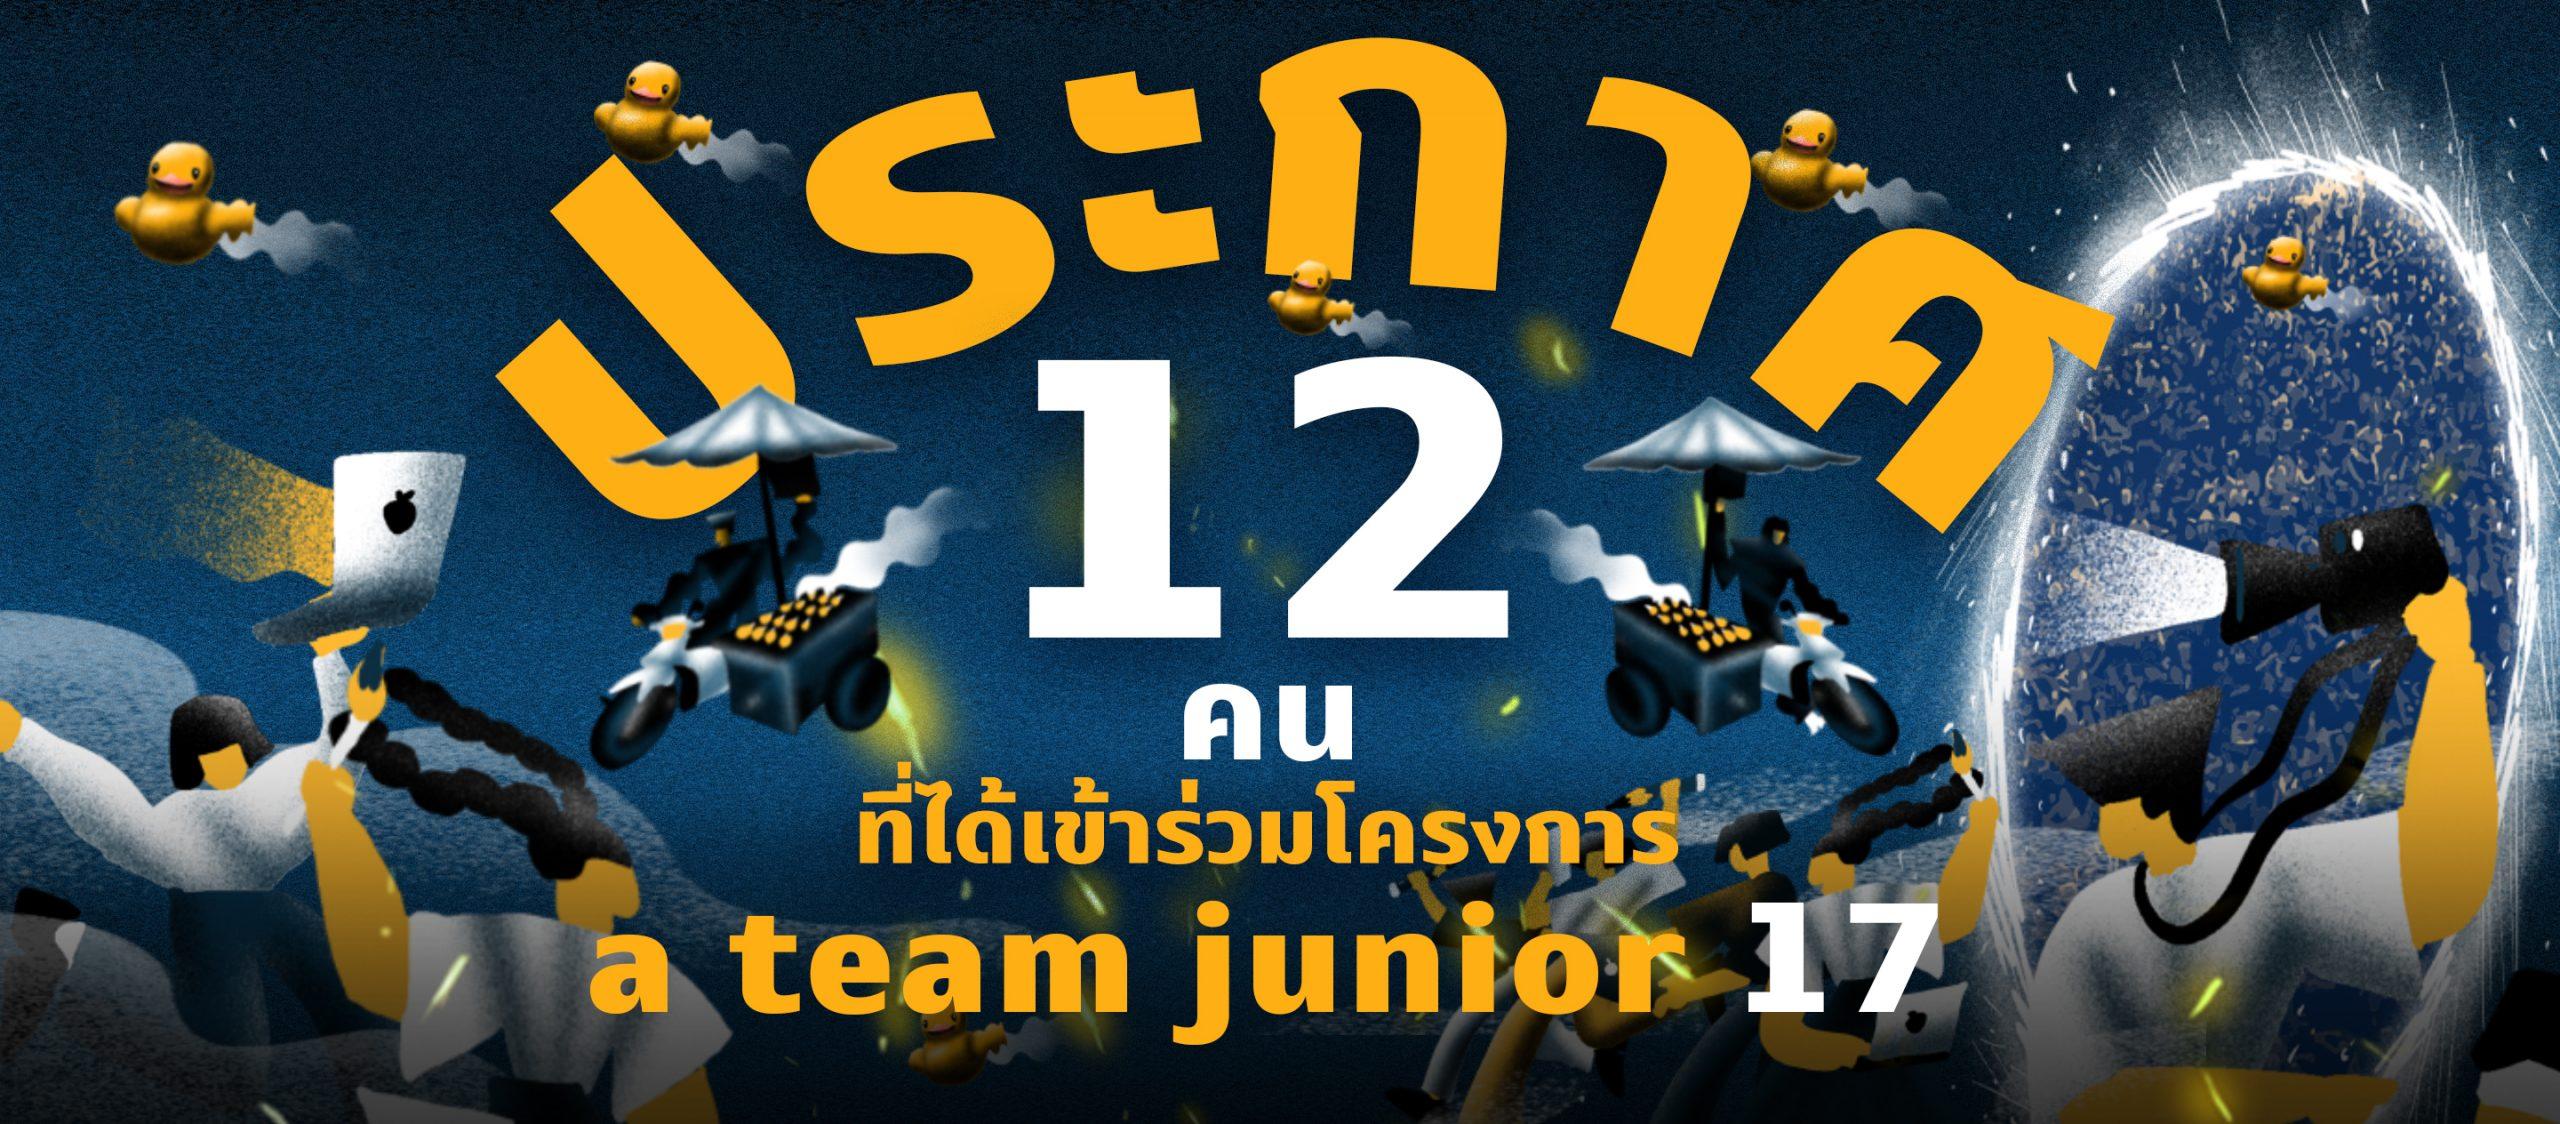 Big Surprise! ประกาศรายชื่อ 12 ตัวจริงใน a team junior 17